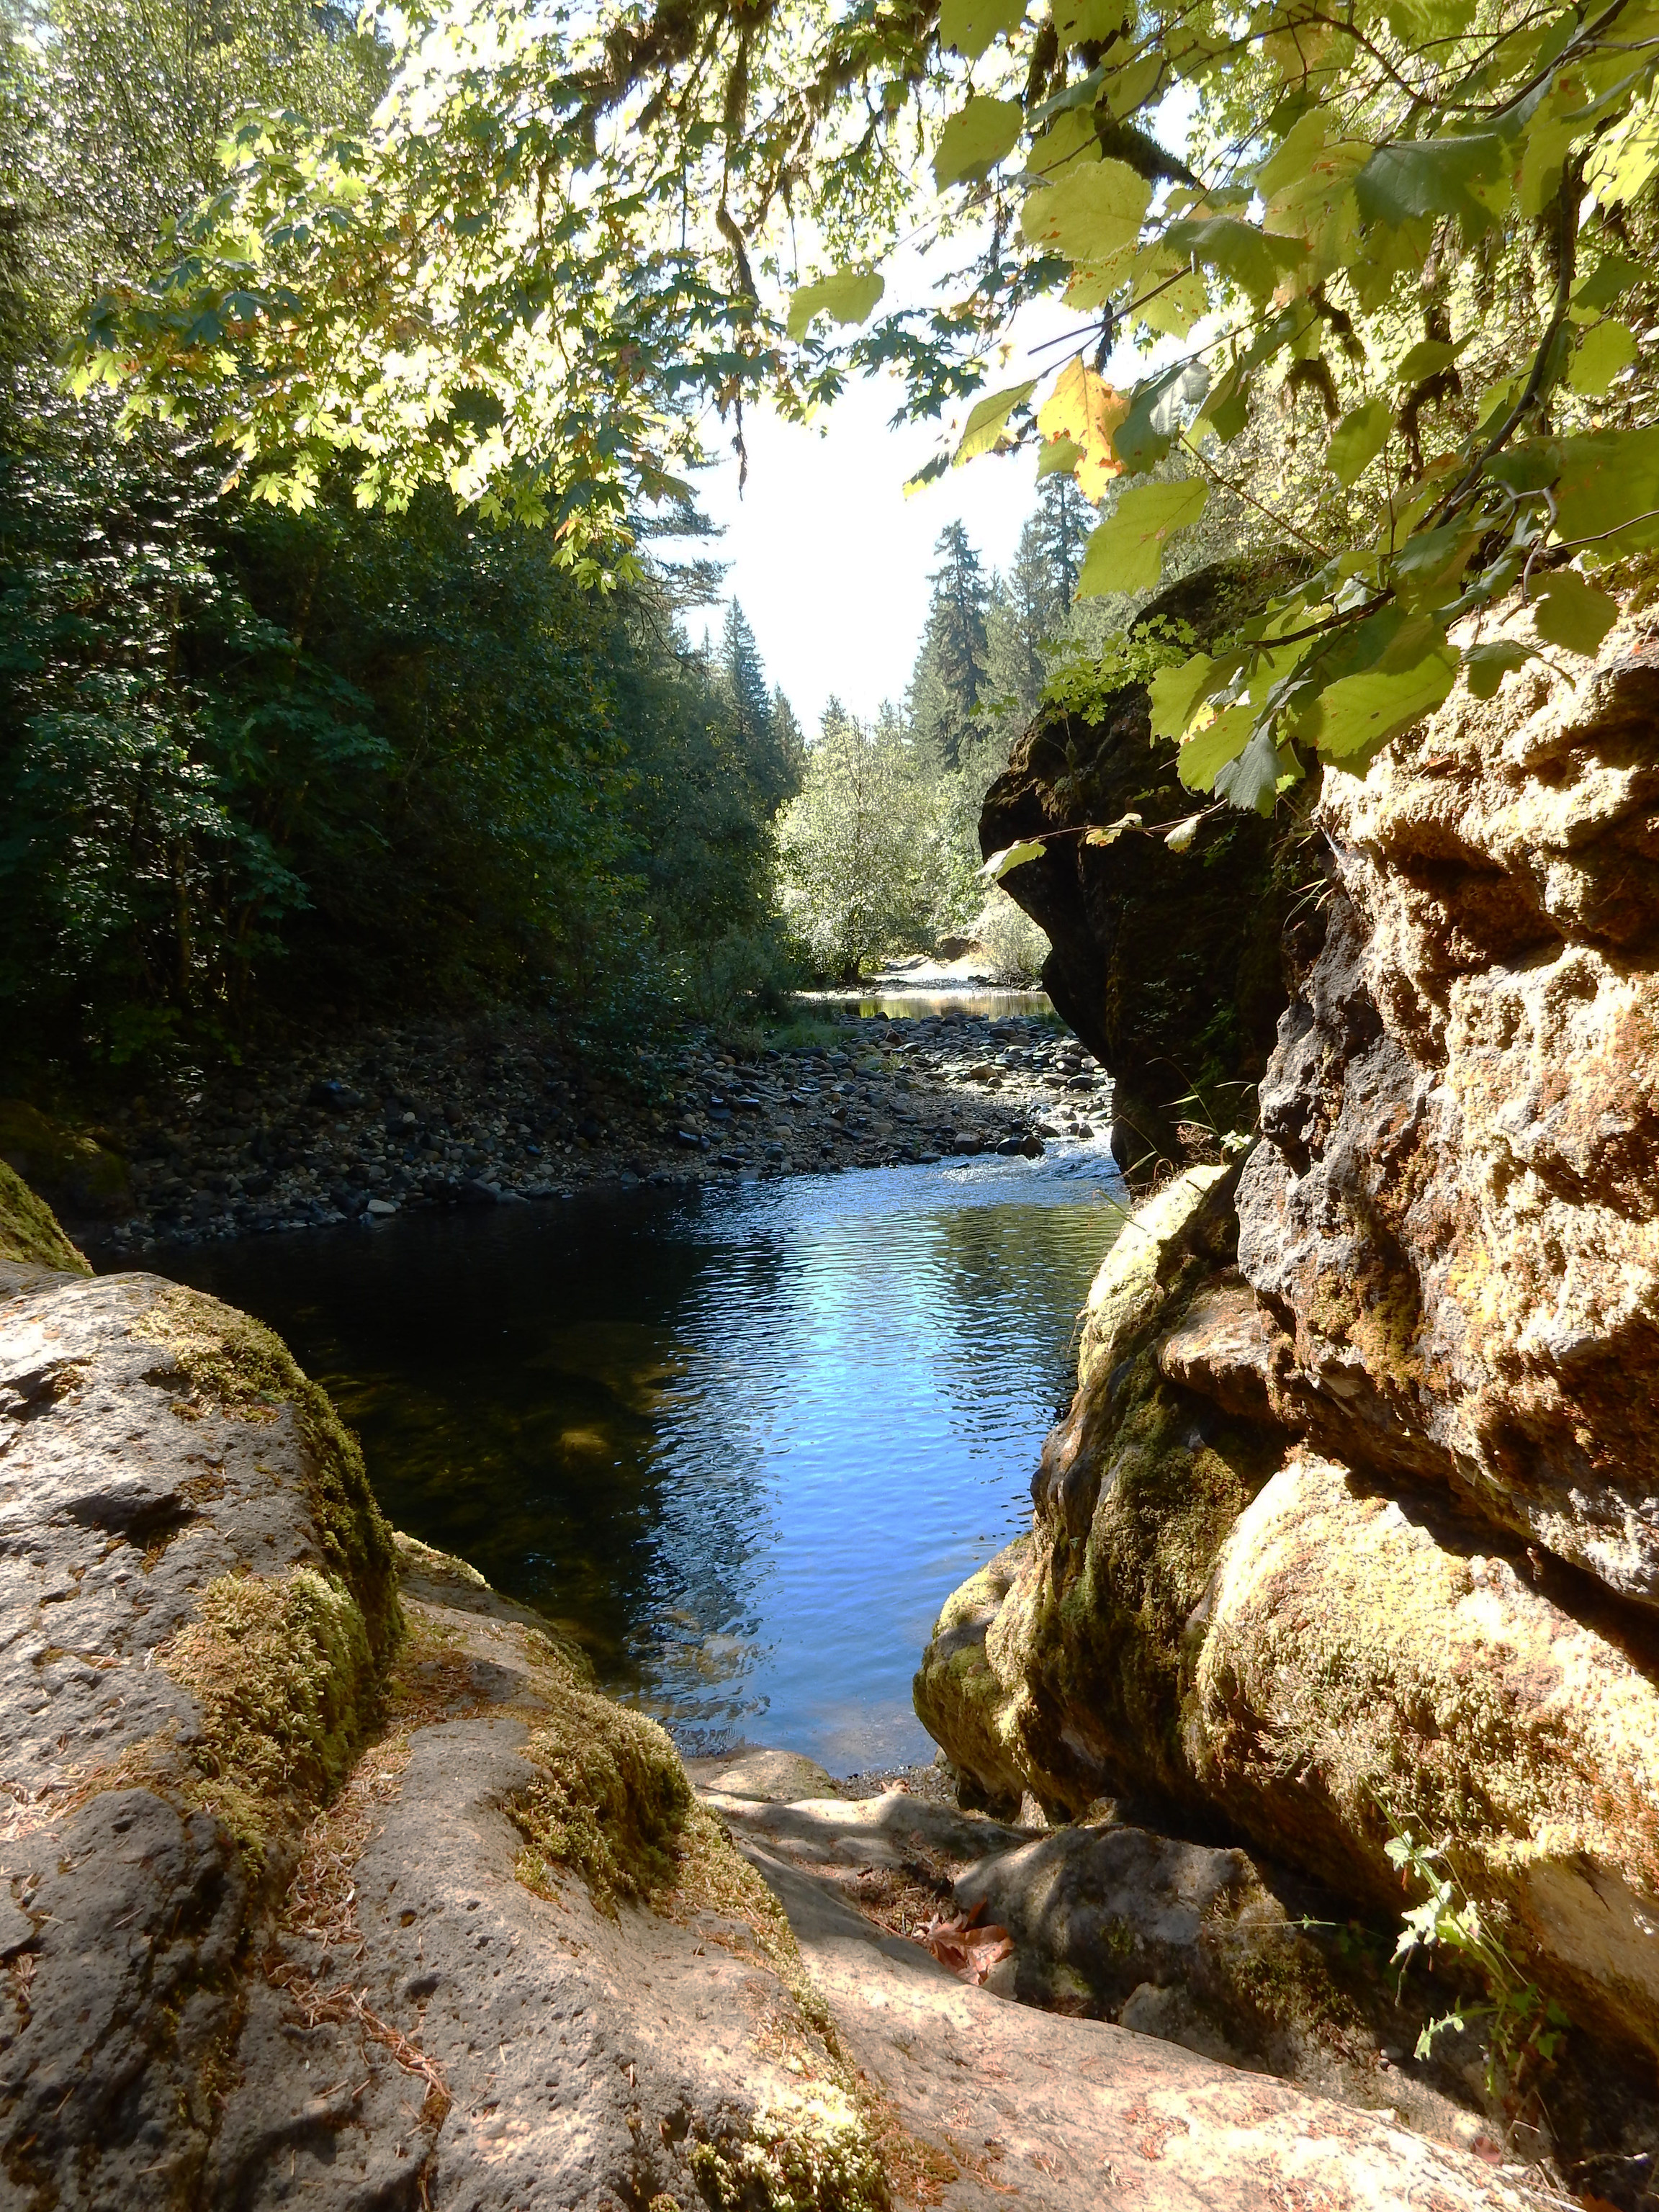 View of Sharps Creek